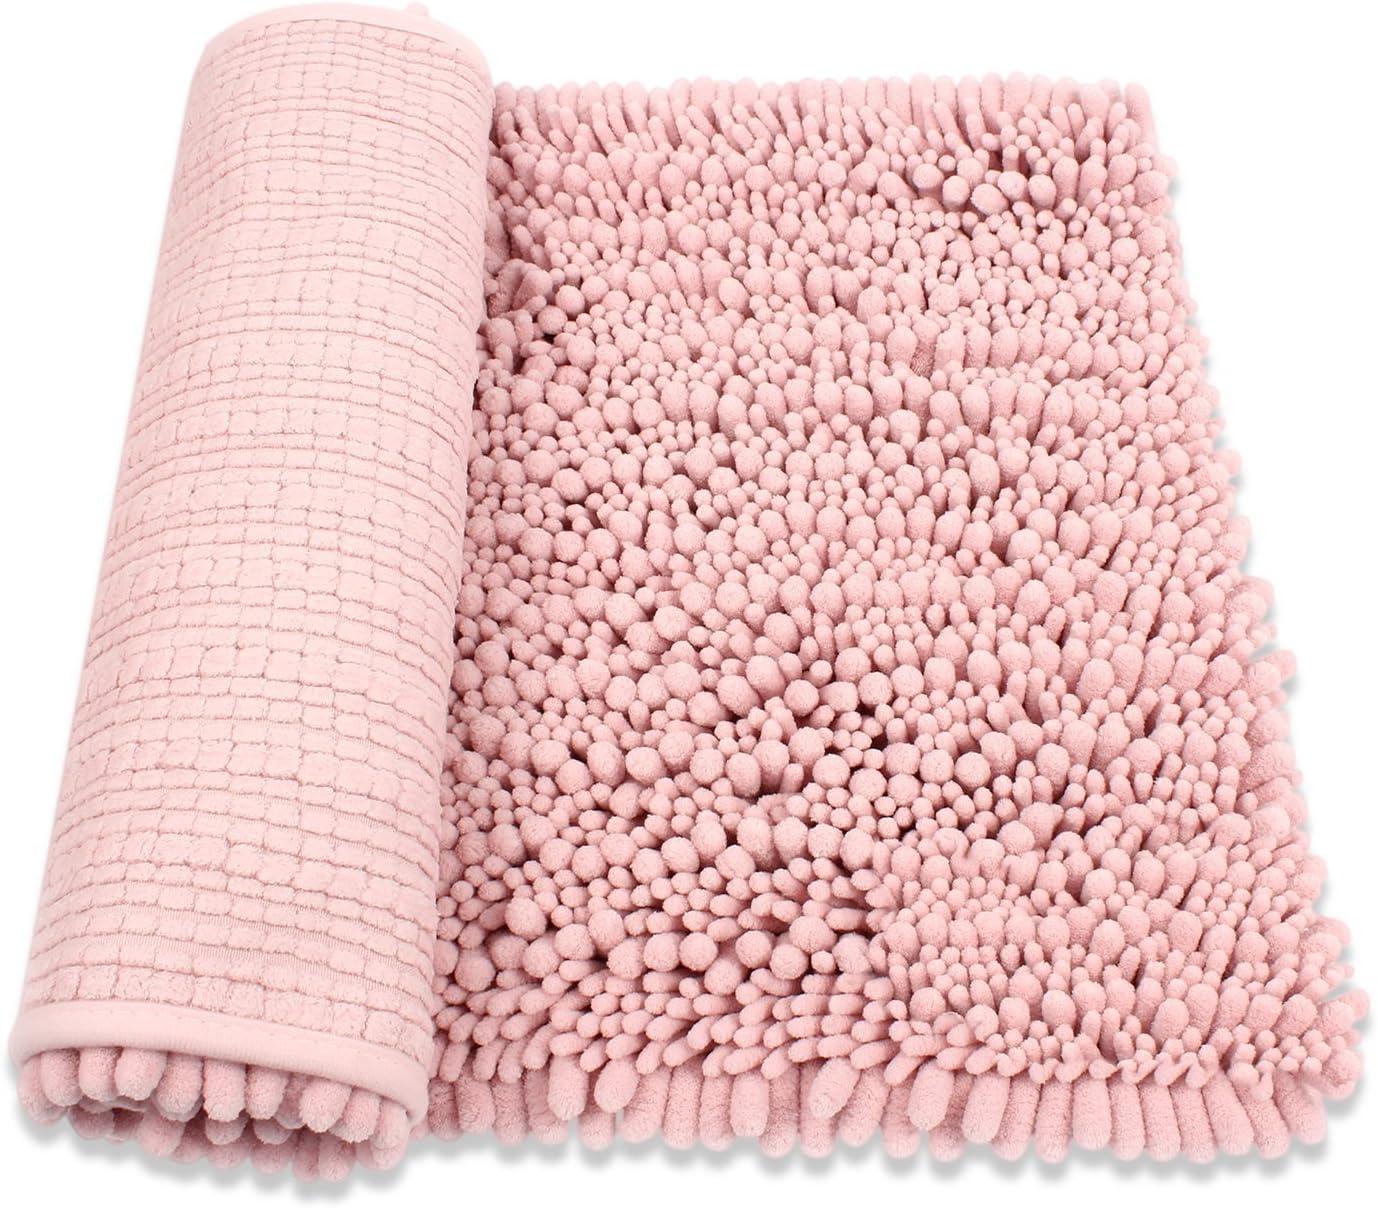 Absorbent Soft Wool Carpet Bath Bathroom Bedroom Floor Shower Mat Rug Non-slip